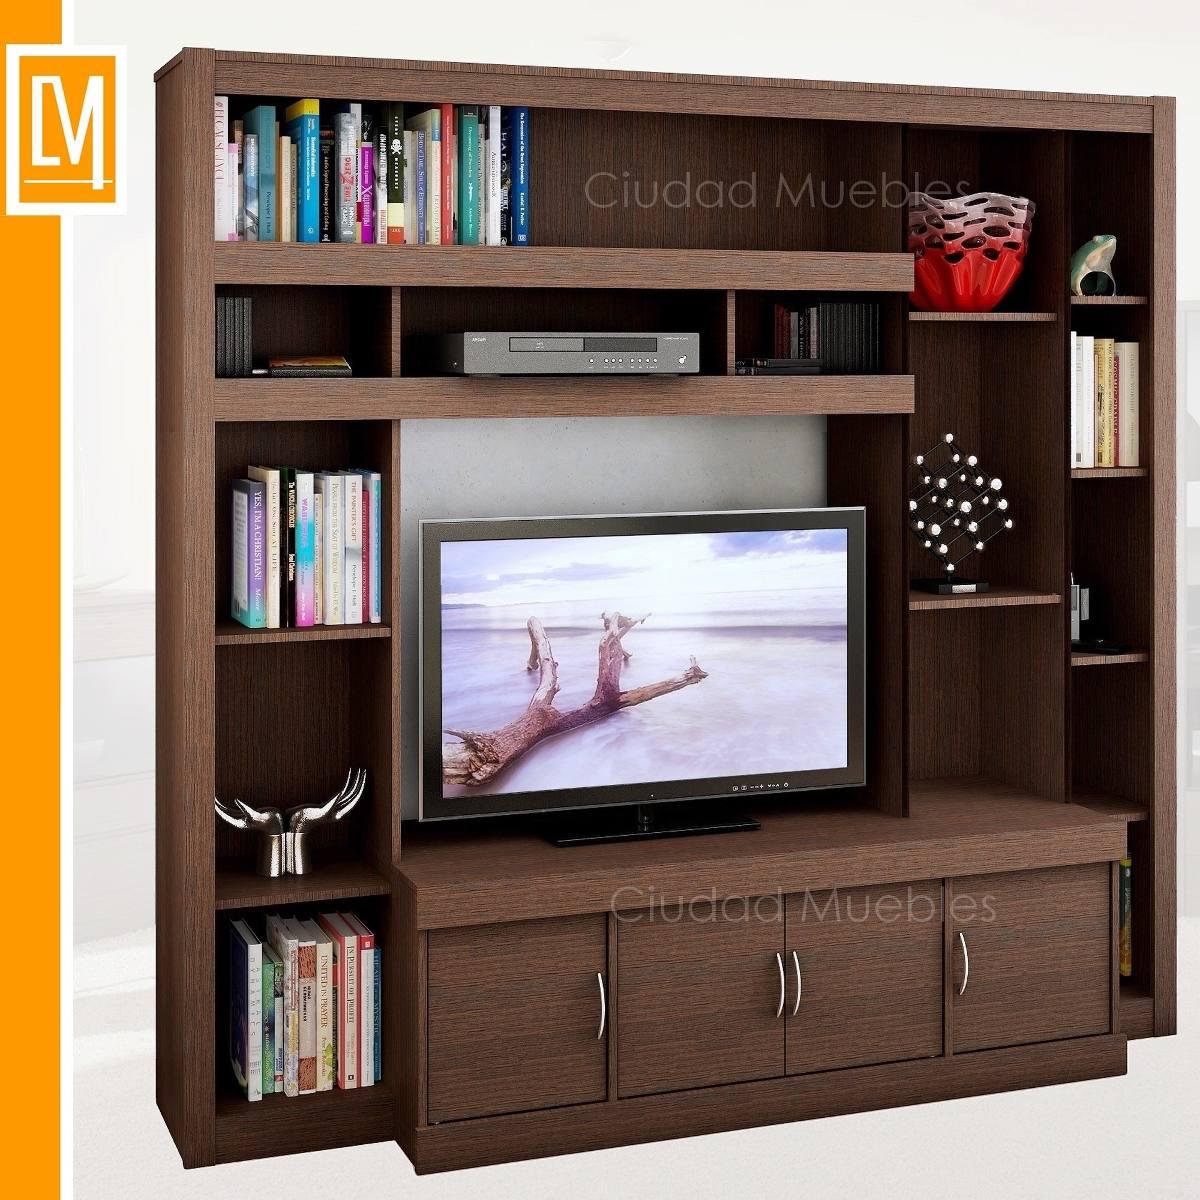 Centro de entretenimiento para tv plasma hasta 47 pulgadas for Mueble de entretenimiento para sala